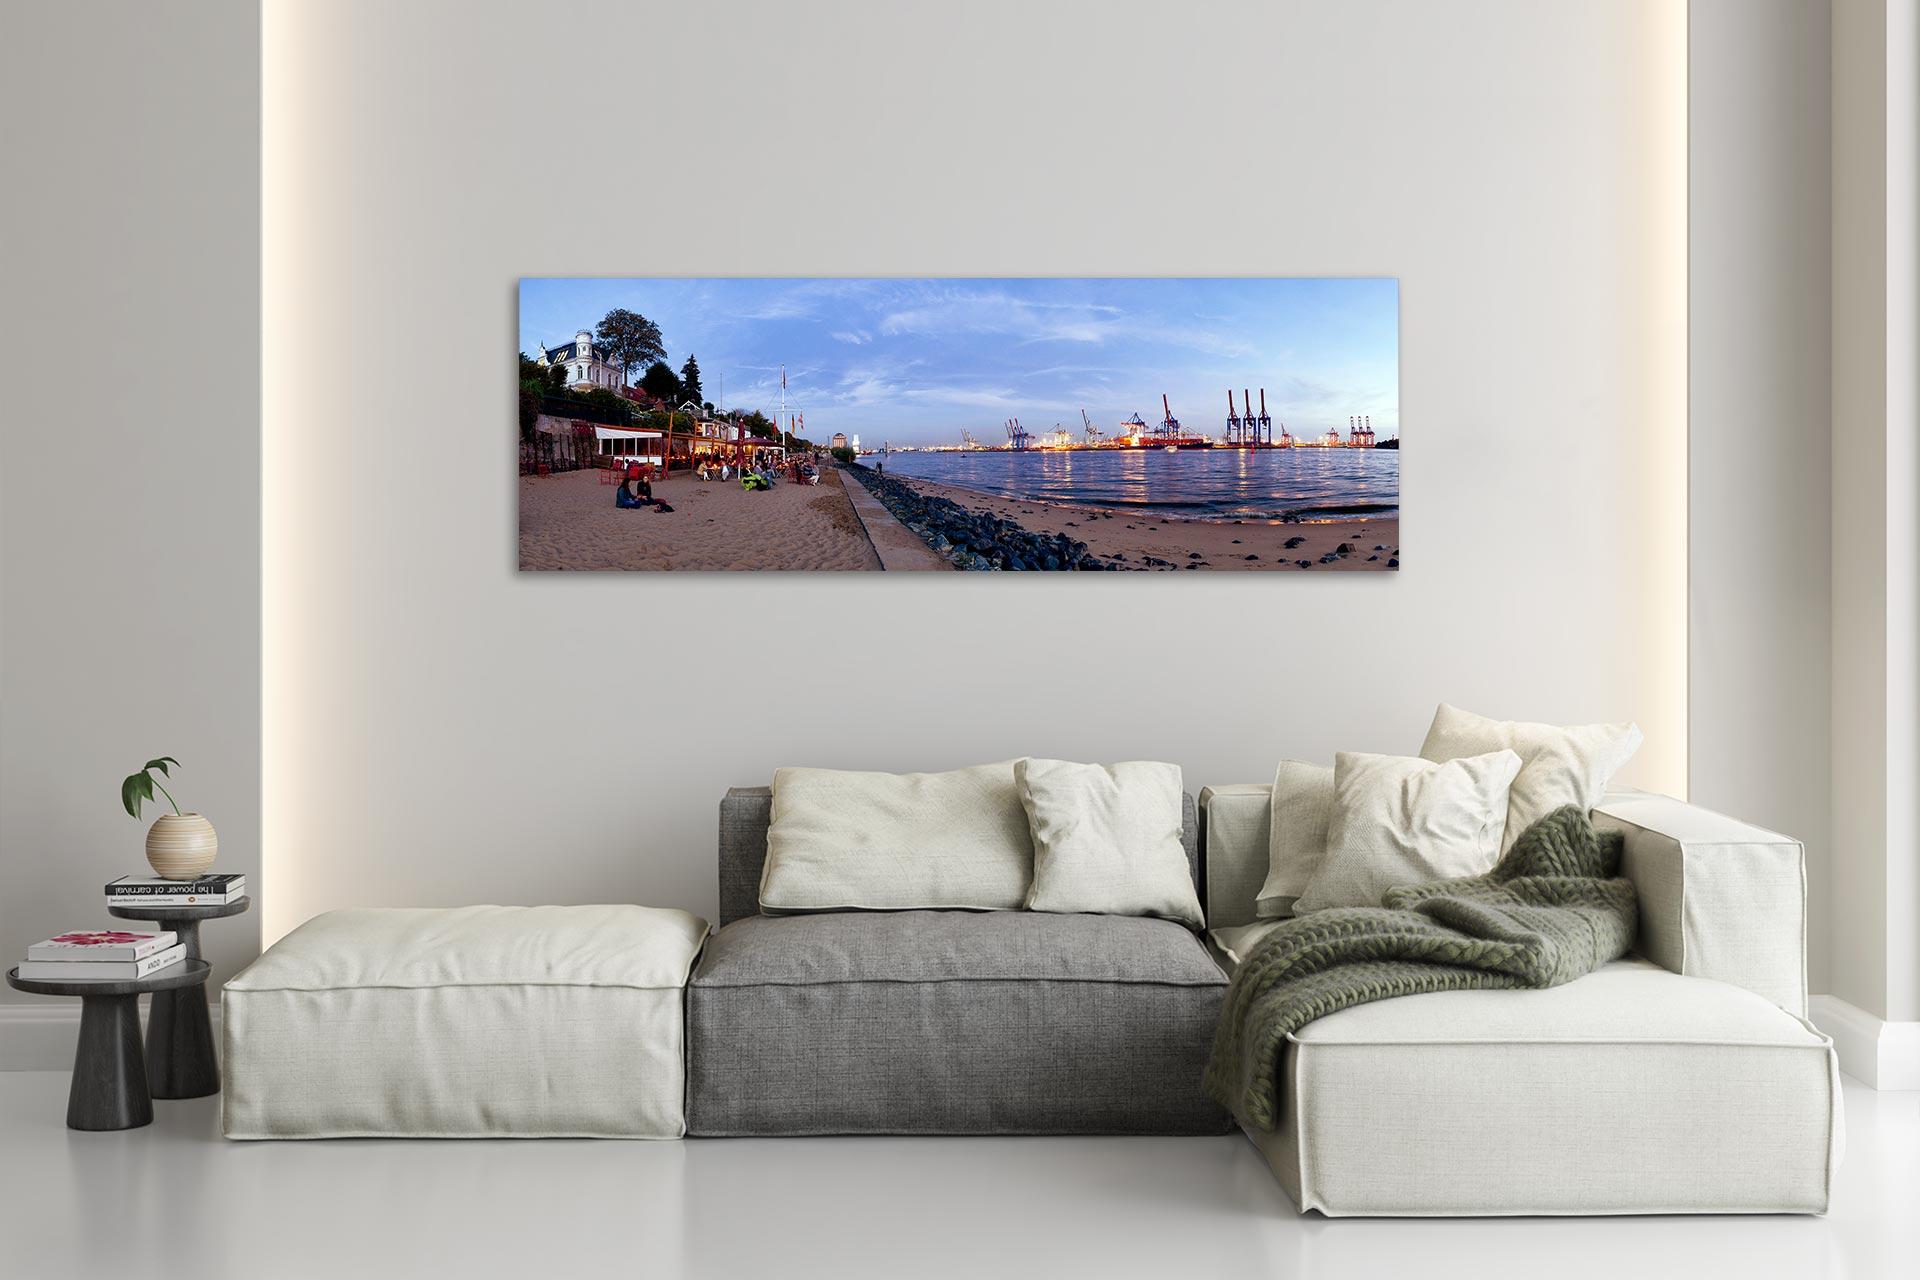 PSW020-elbstrand-panorama-hamburg-wandbild-leinwand-acrylglas-aludibond-wohnzimmer